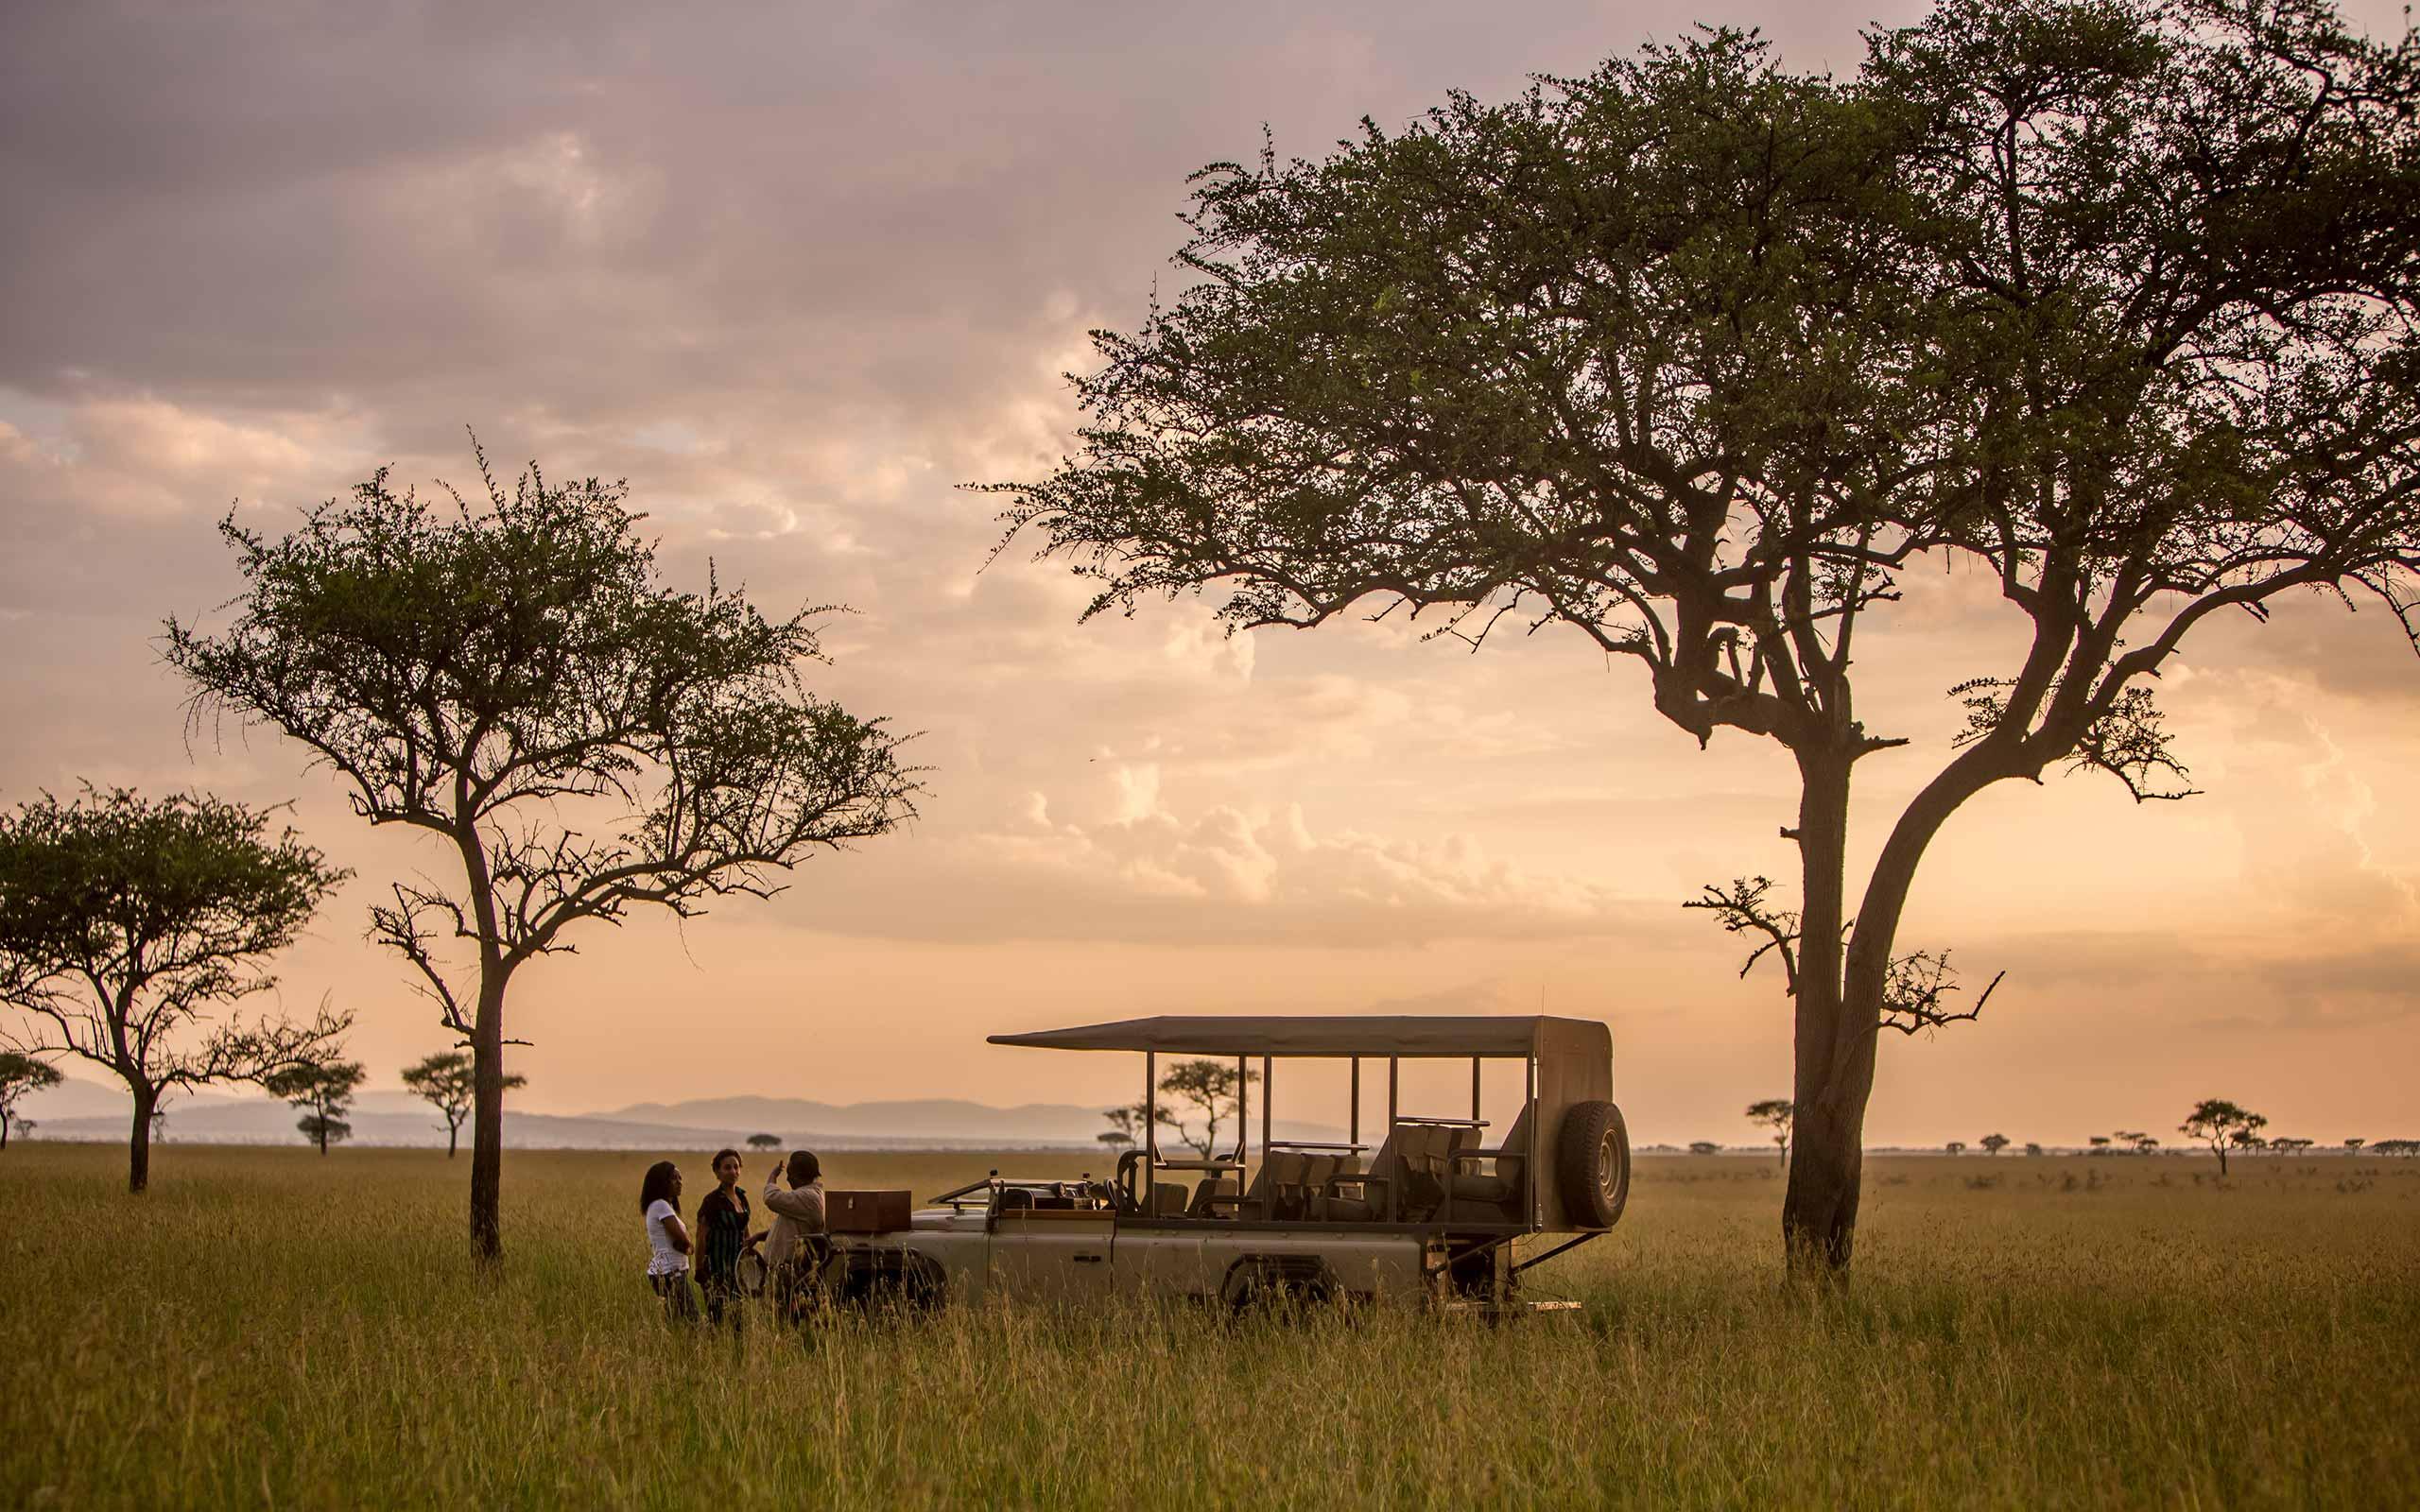 enkosi-africa-safari-tanzania-serengeti-grumeti-singita-fau-faru-landscape